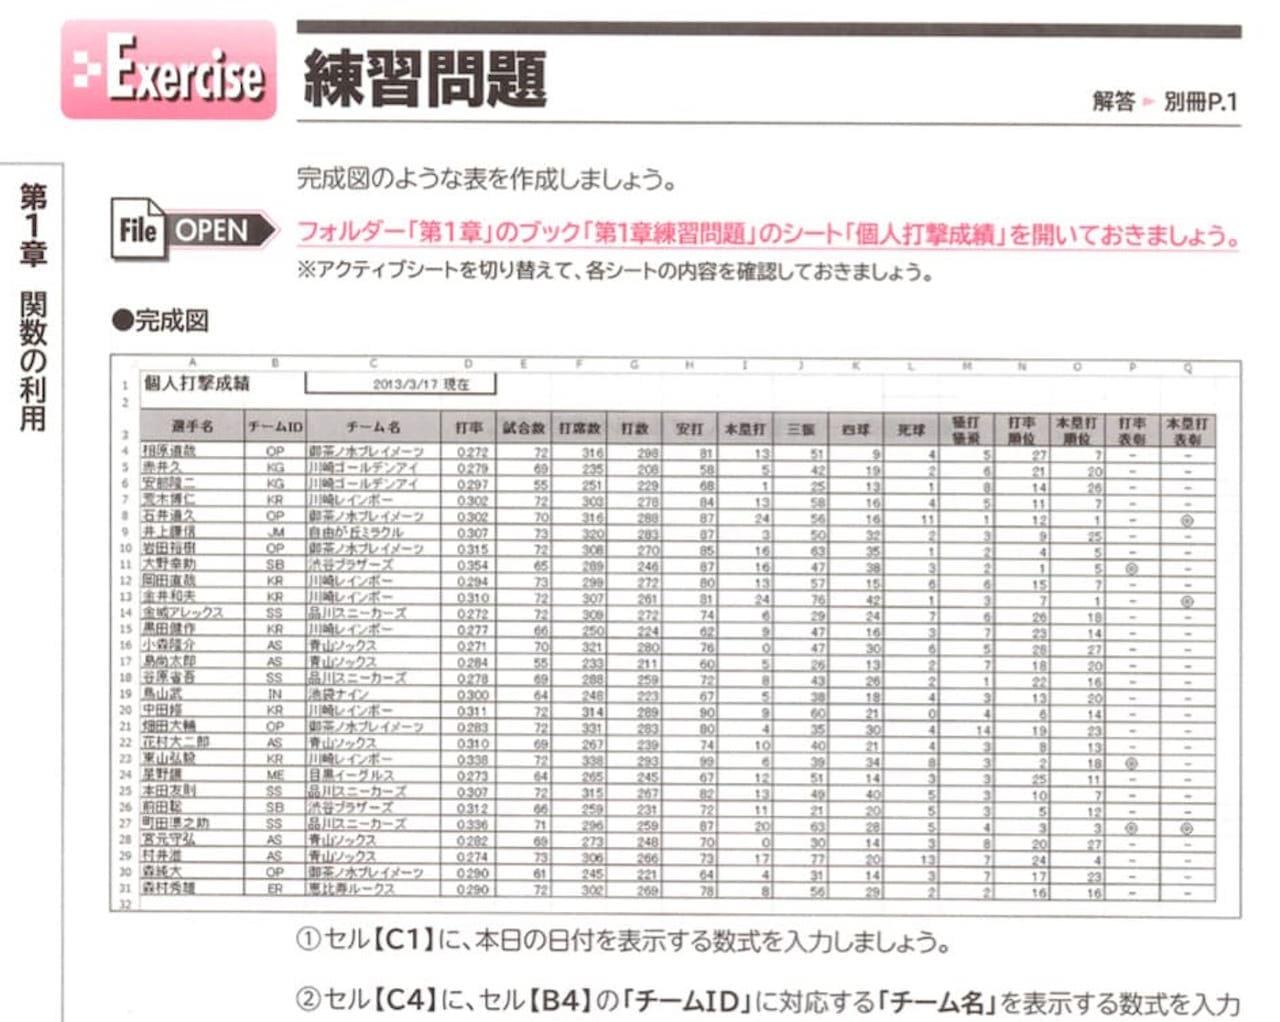 FOM出版よくわかるExcel2013応用の参考画像②